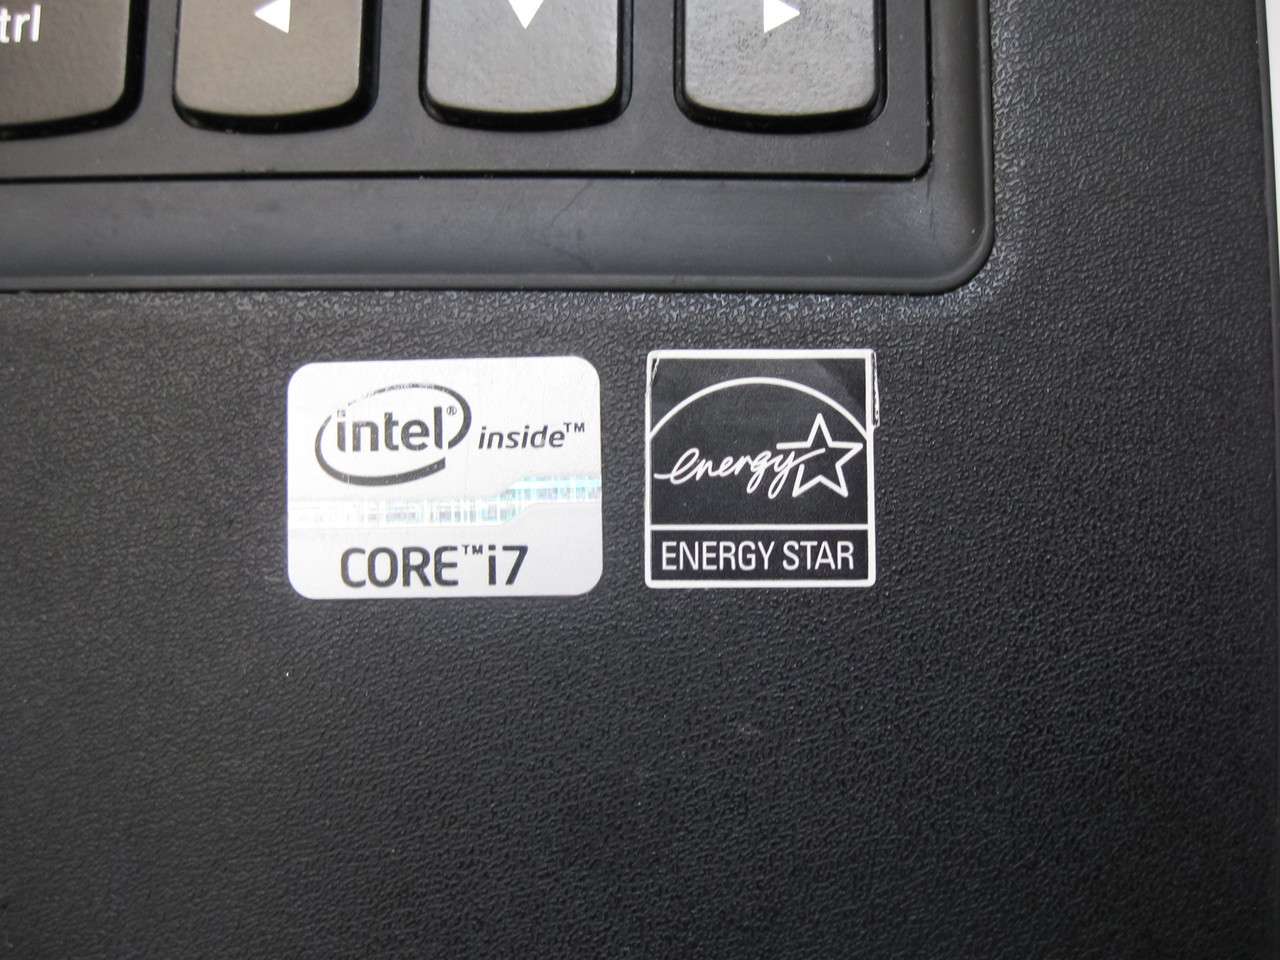 Трансформер Lenovo Yoga 13 IPS 13.3  (1600x900) / Intel Core i7-3517U  3